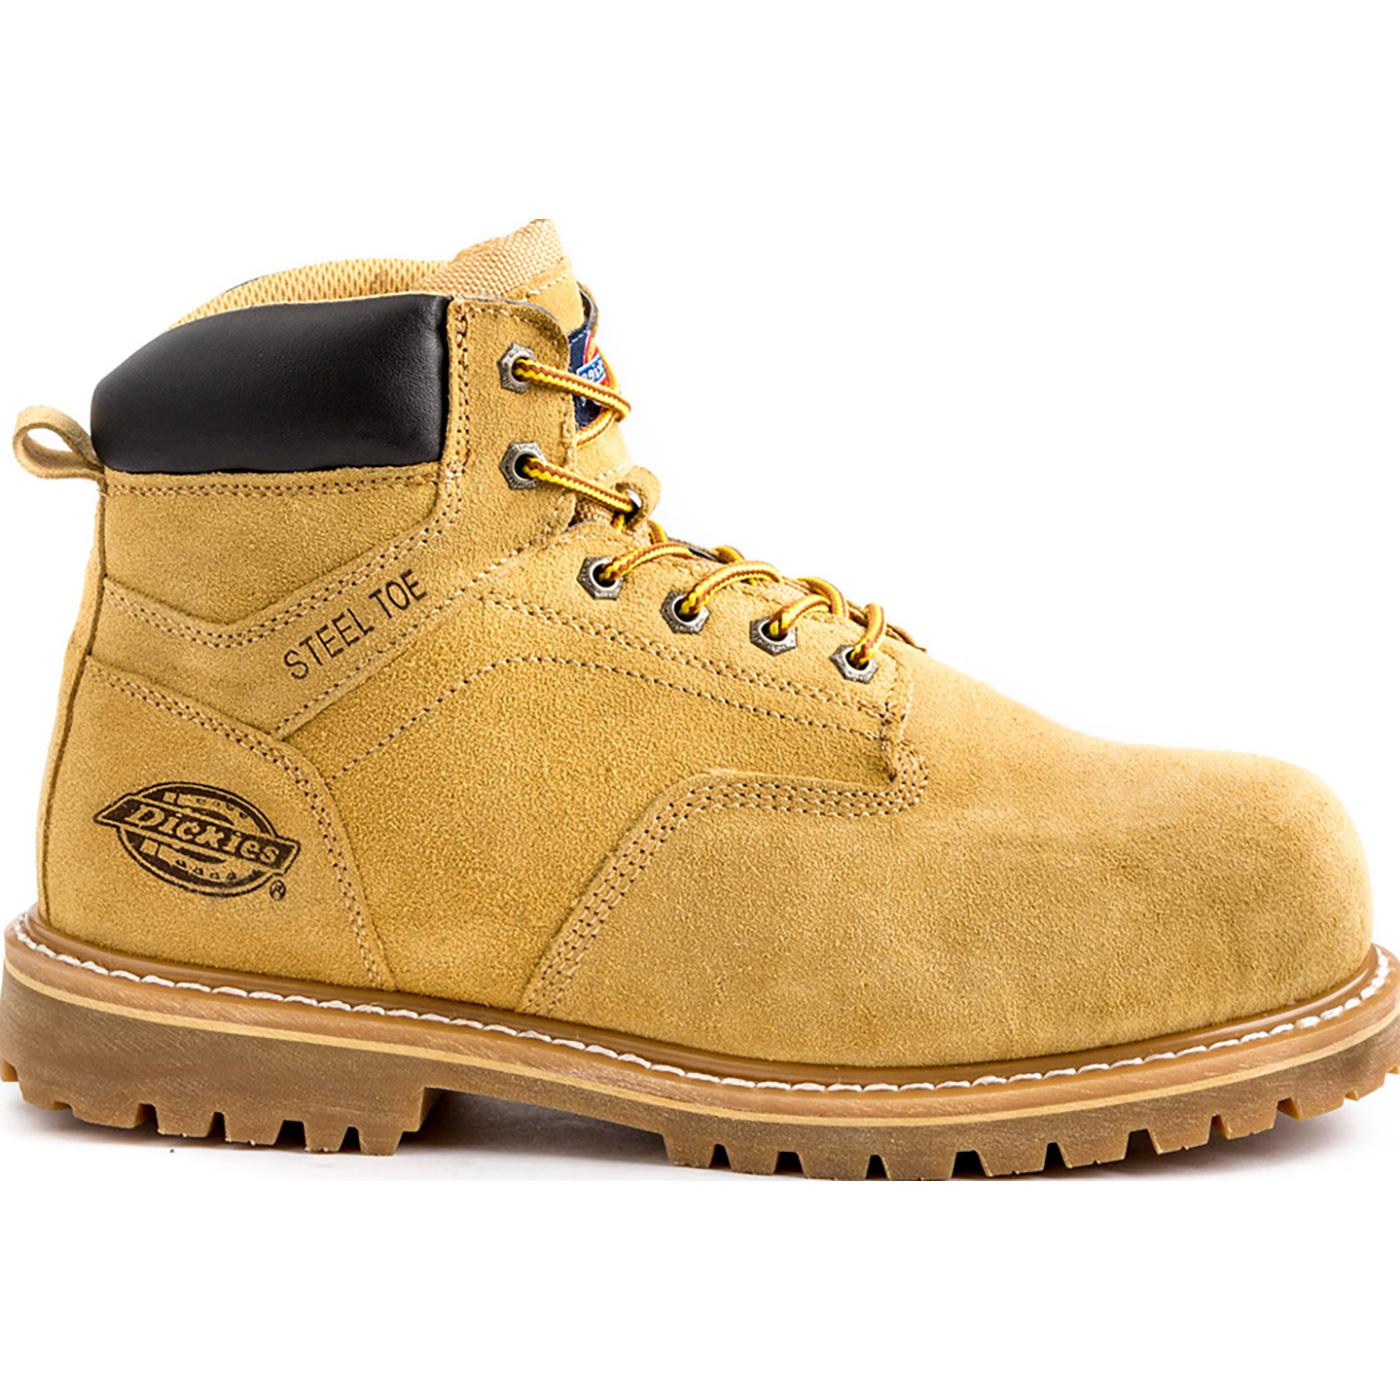 4535422ad31 Dickies Prowler Men's 6 Inch Steel Toe Electrical Hazard Work Boot